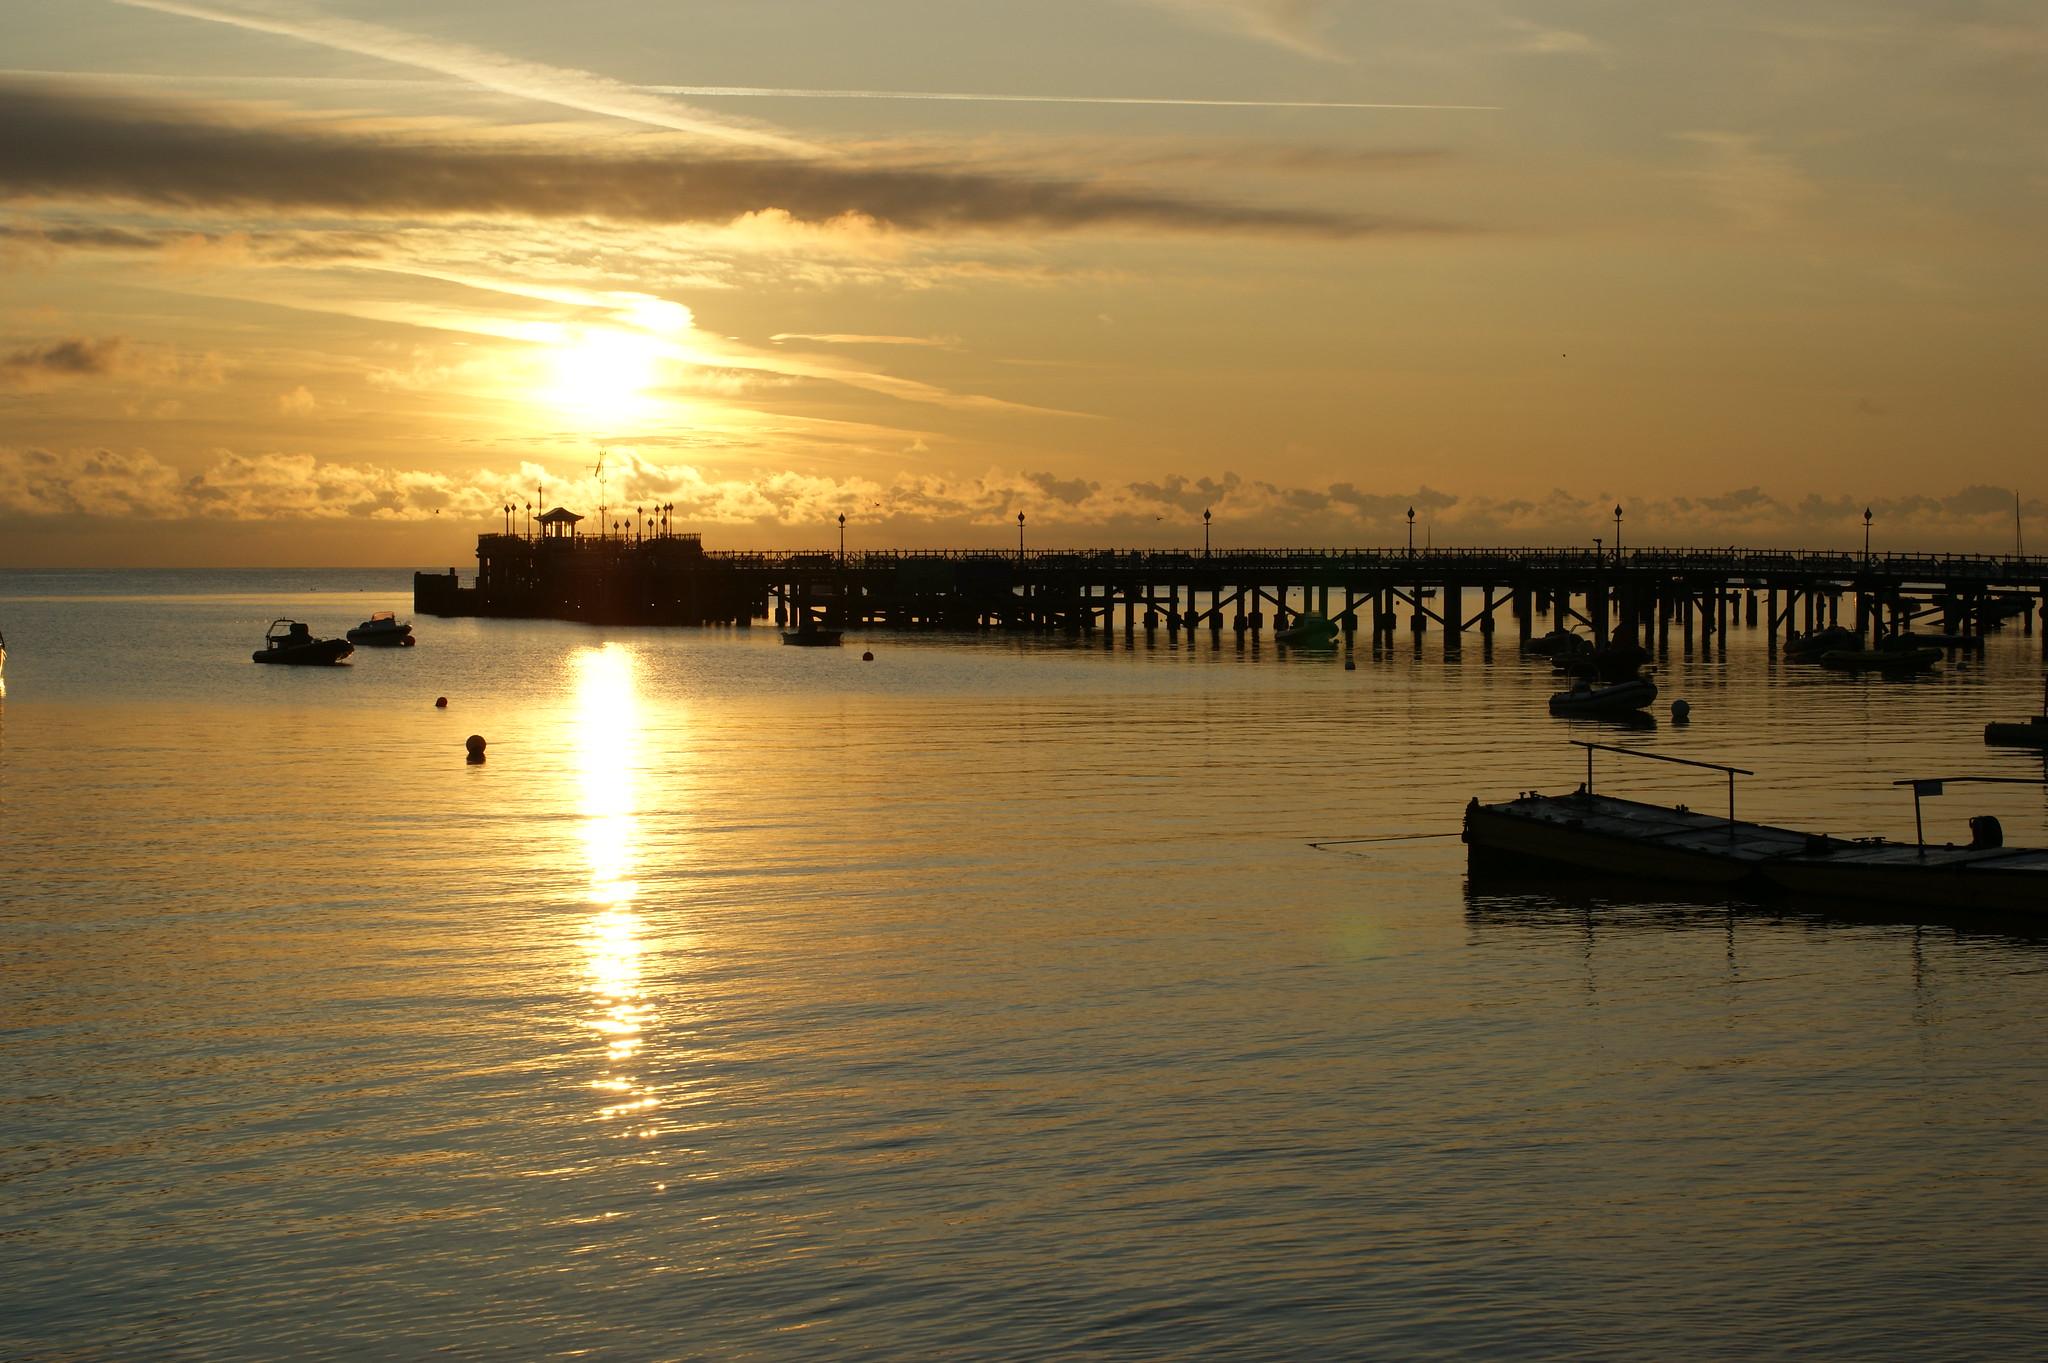 Sunset Swanage pier | Brownsea Island